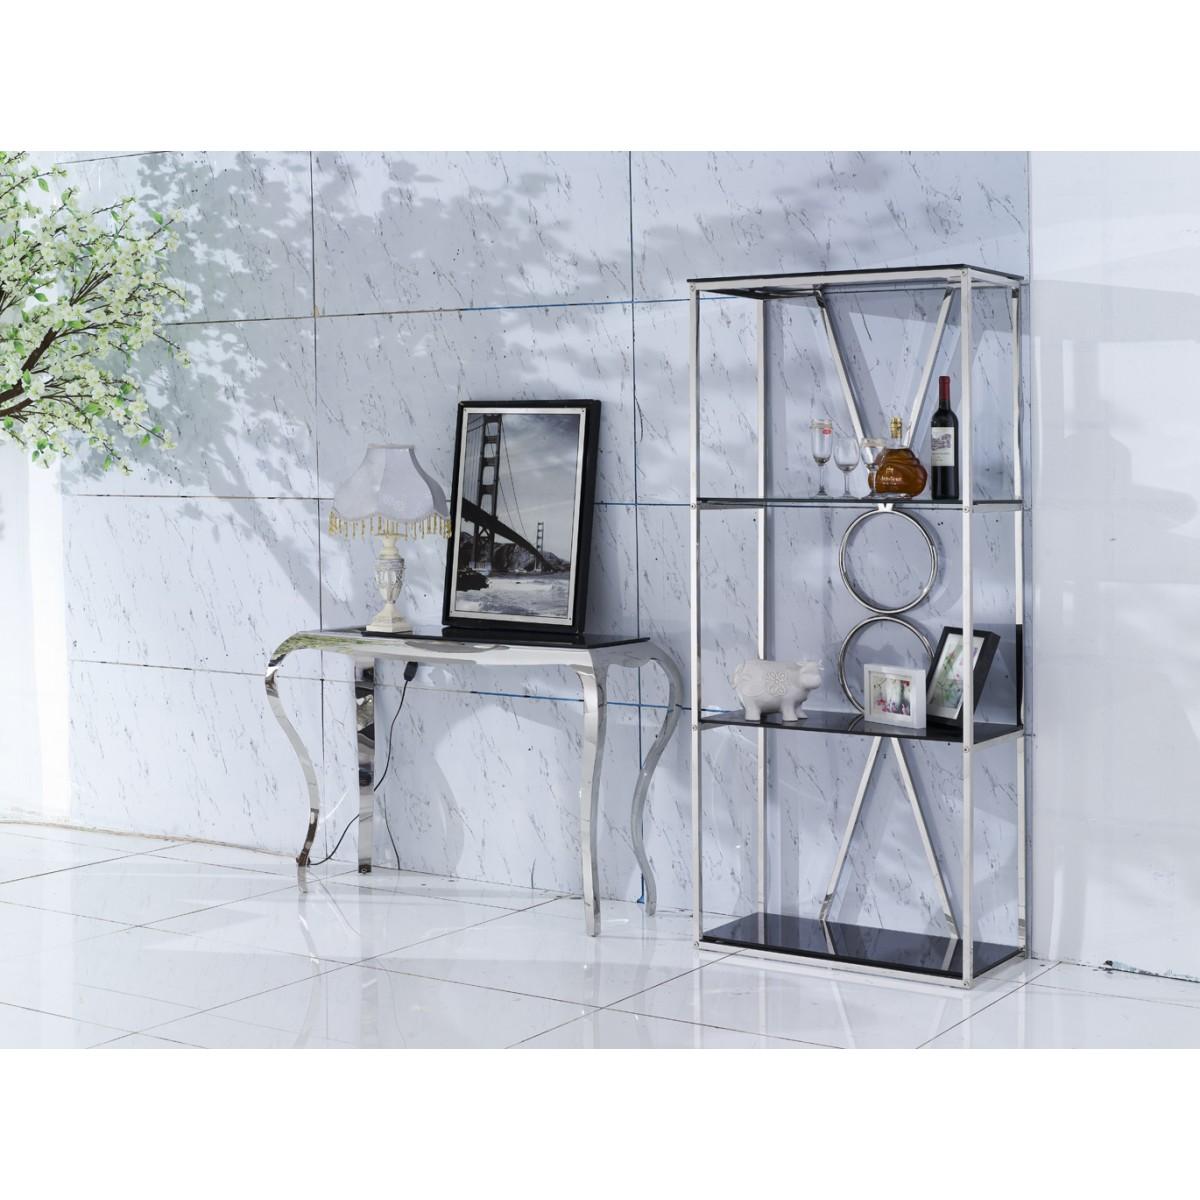 Table console en verre et inox princesse - Table basse verre et inox ...